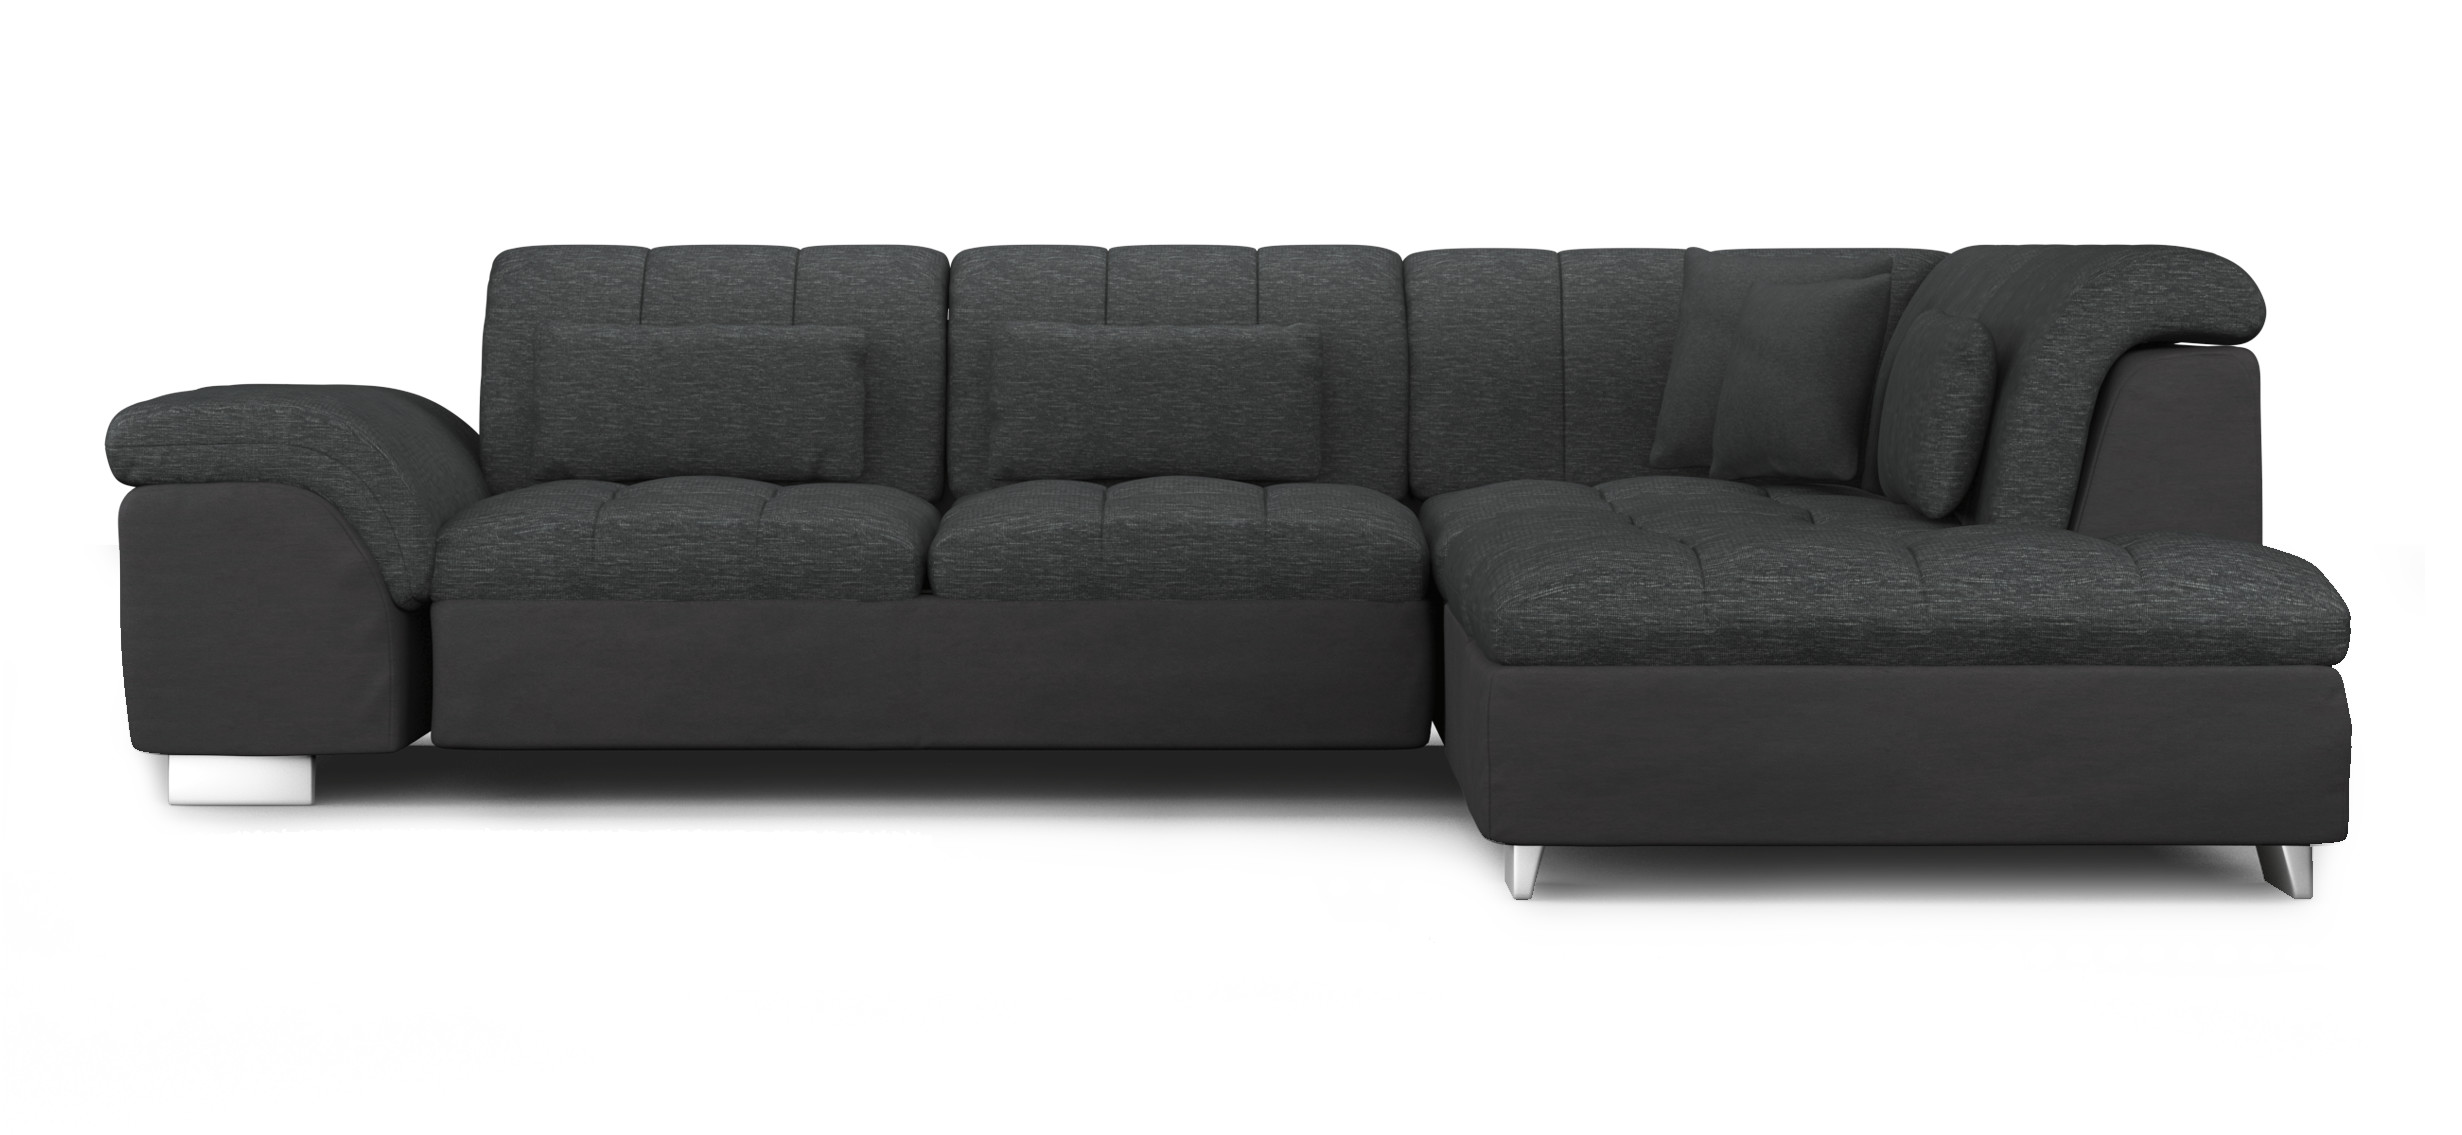 megapol sofa isola modern sofas on sale raumbild